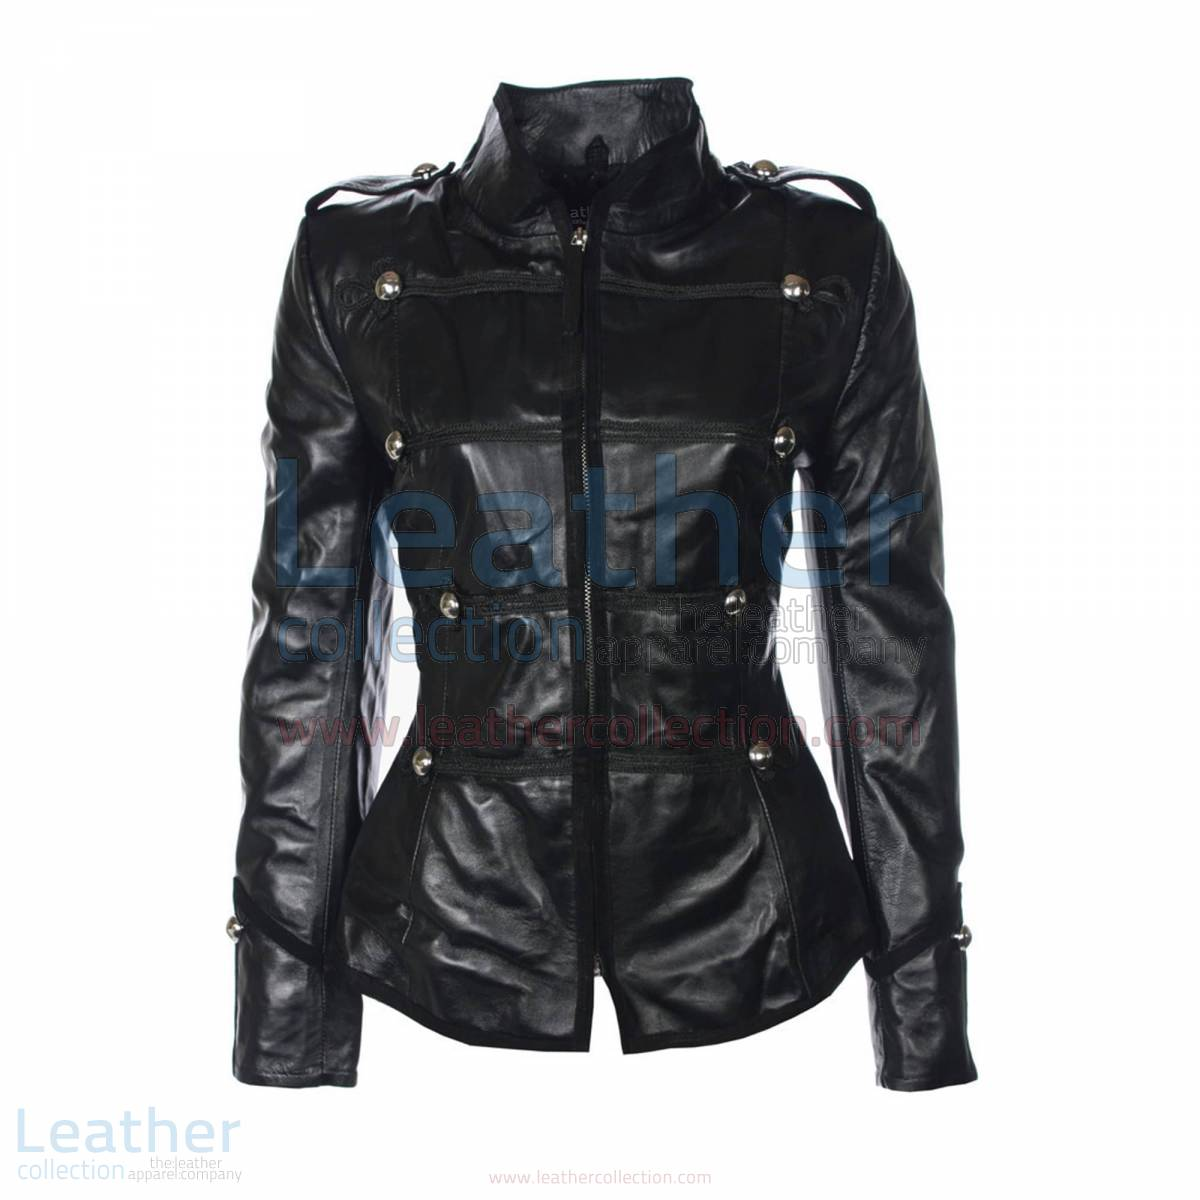 Princess Military Leather Jacket –  Jacket